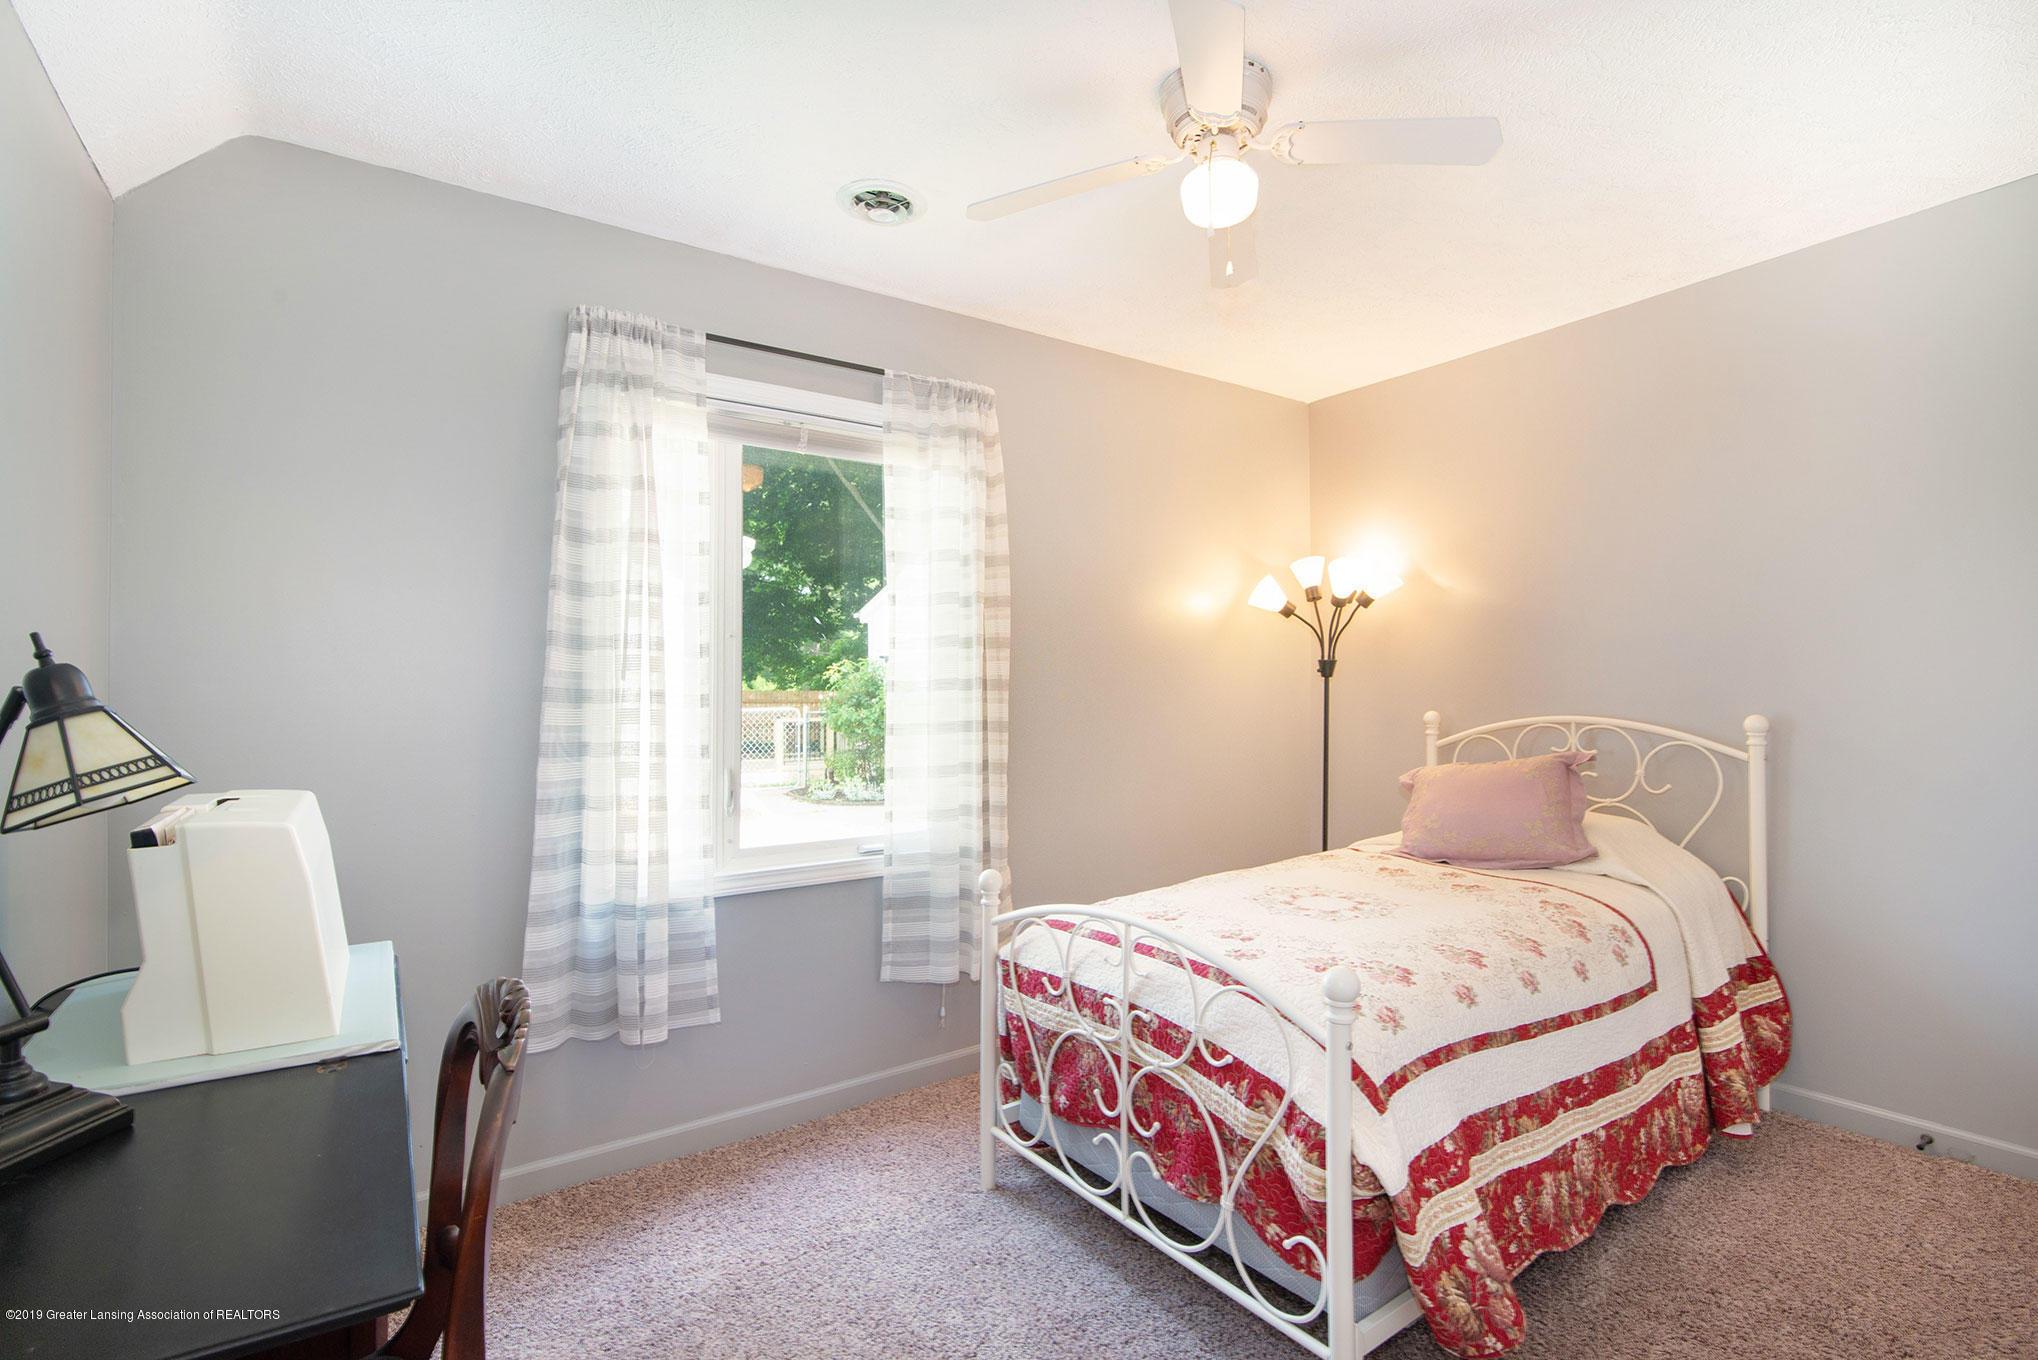 2034 Adelpha Ave - Bedroom - 12